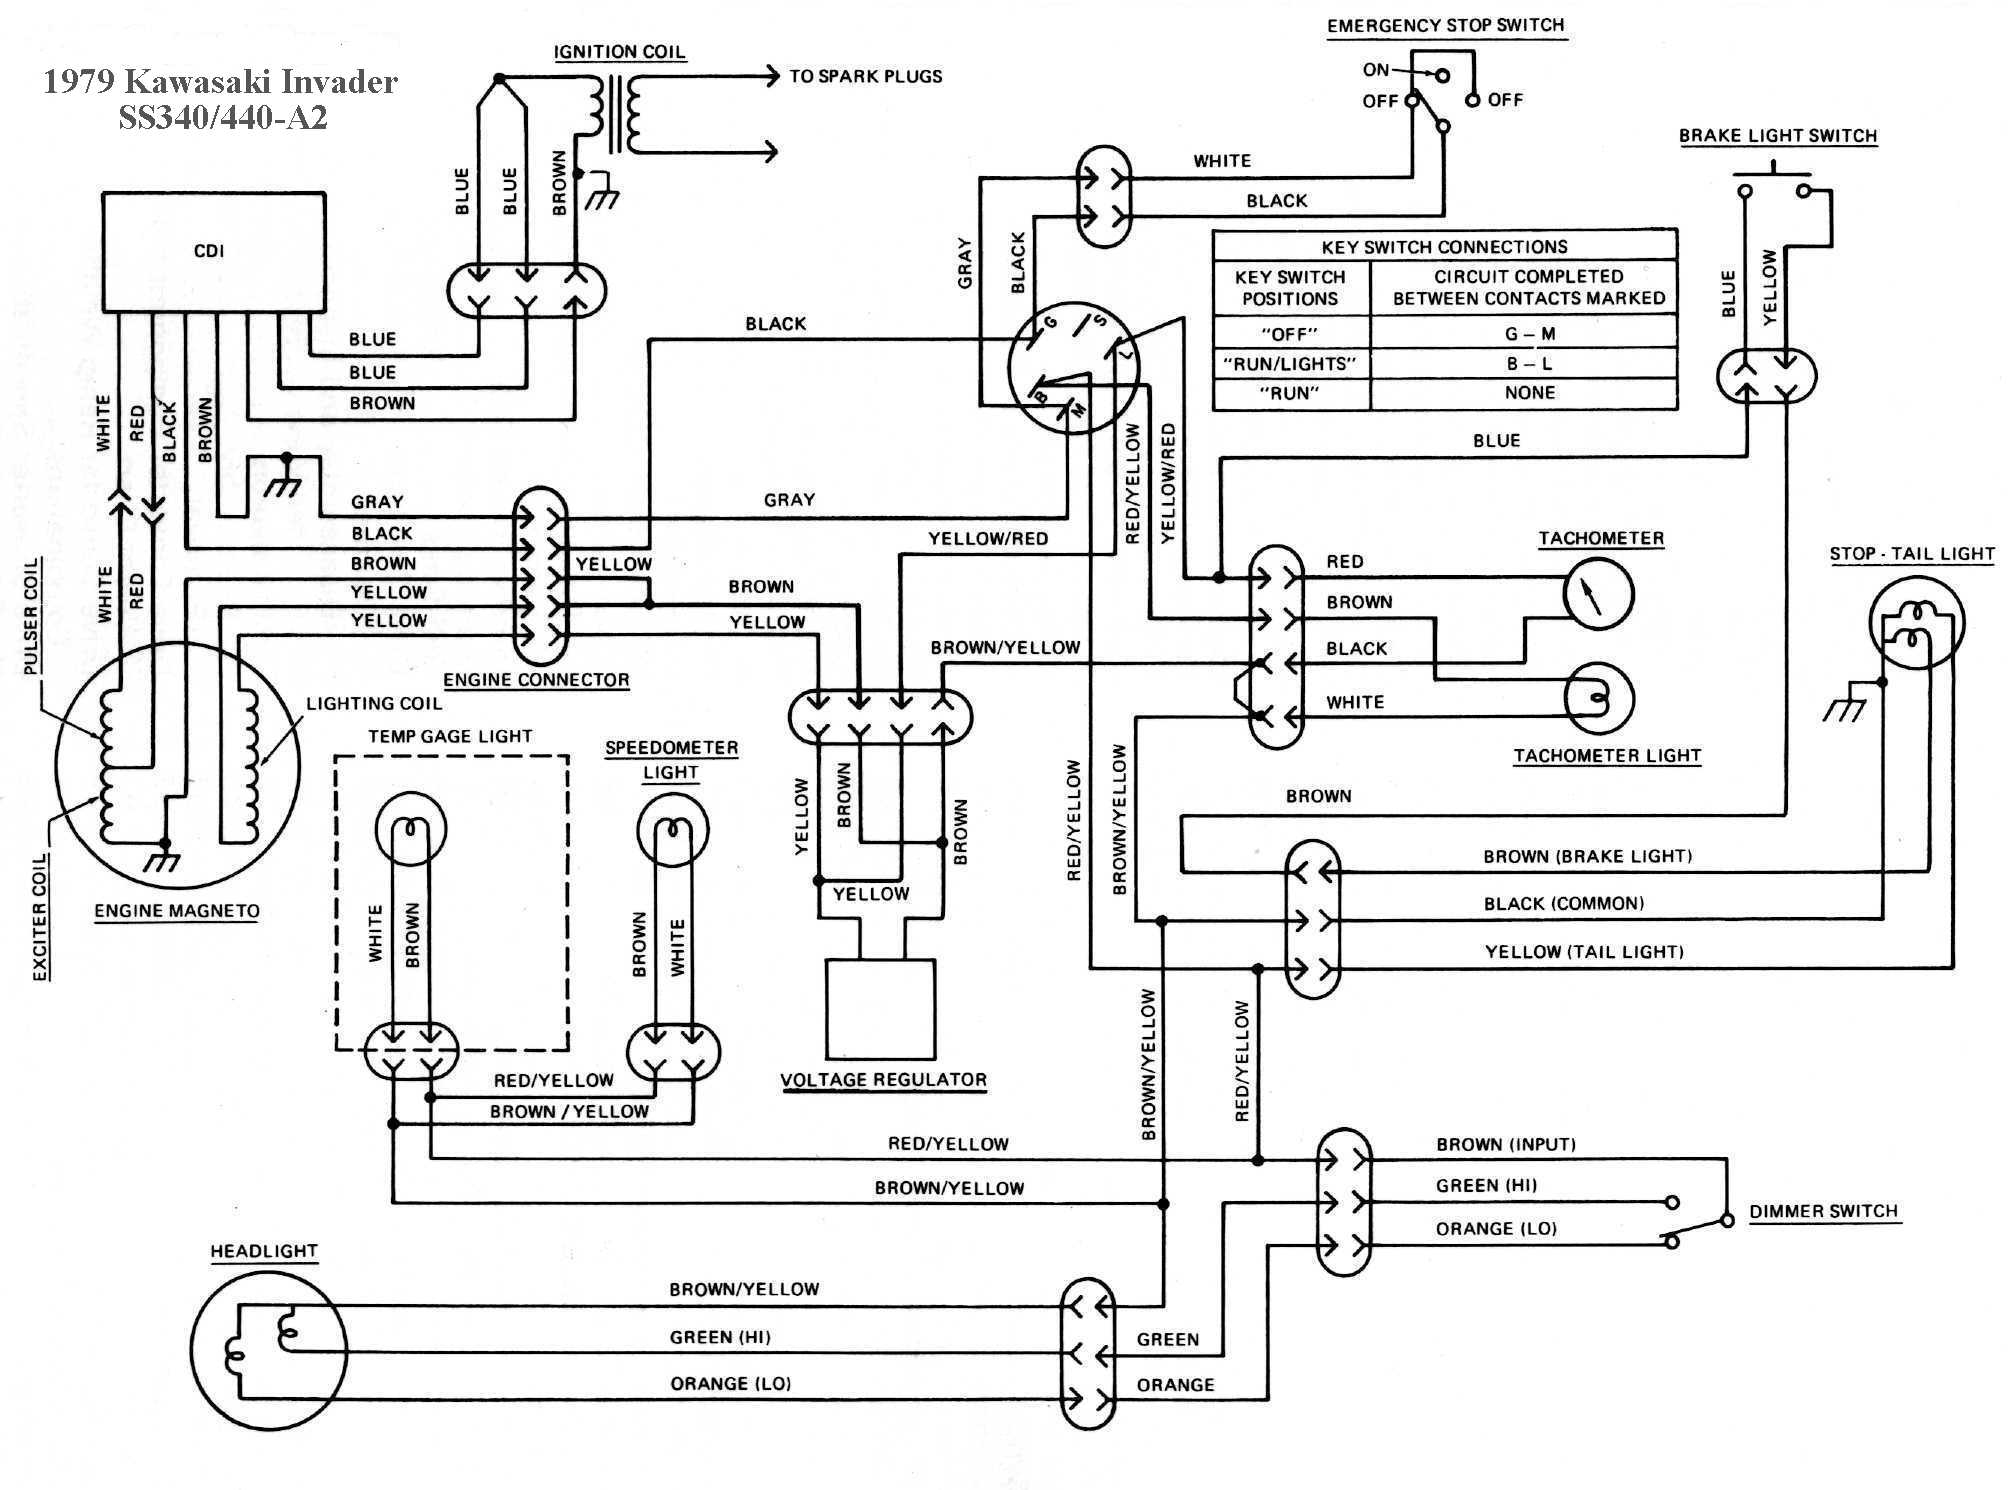 [SCHEMATICS_4JK]  Kawasaki Bayou 300 Fuse Box - 2006 Dodge 2500 Fuse Box Location for Wiring  Diagram Schematics   1988 Kawasaki Bayou 220 Wiring Diagram      Wiring Diagram Schematics